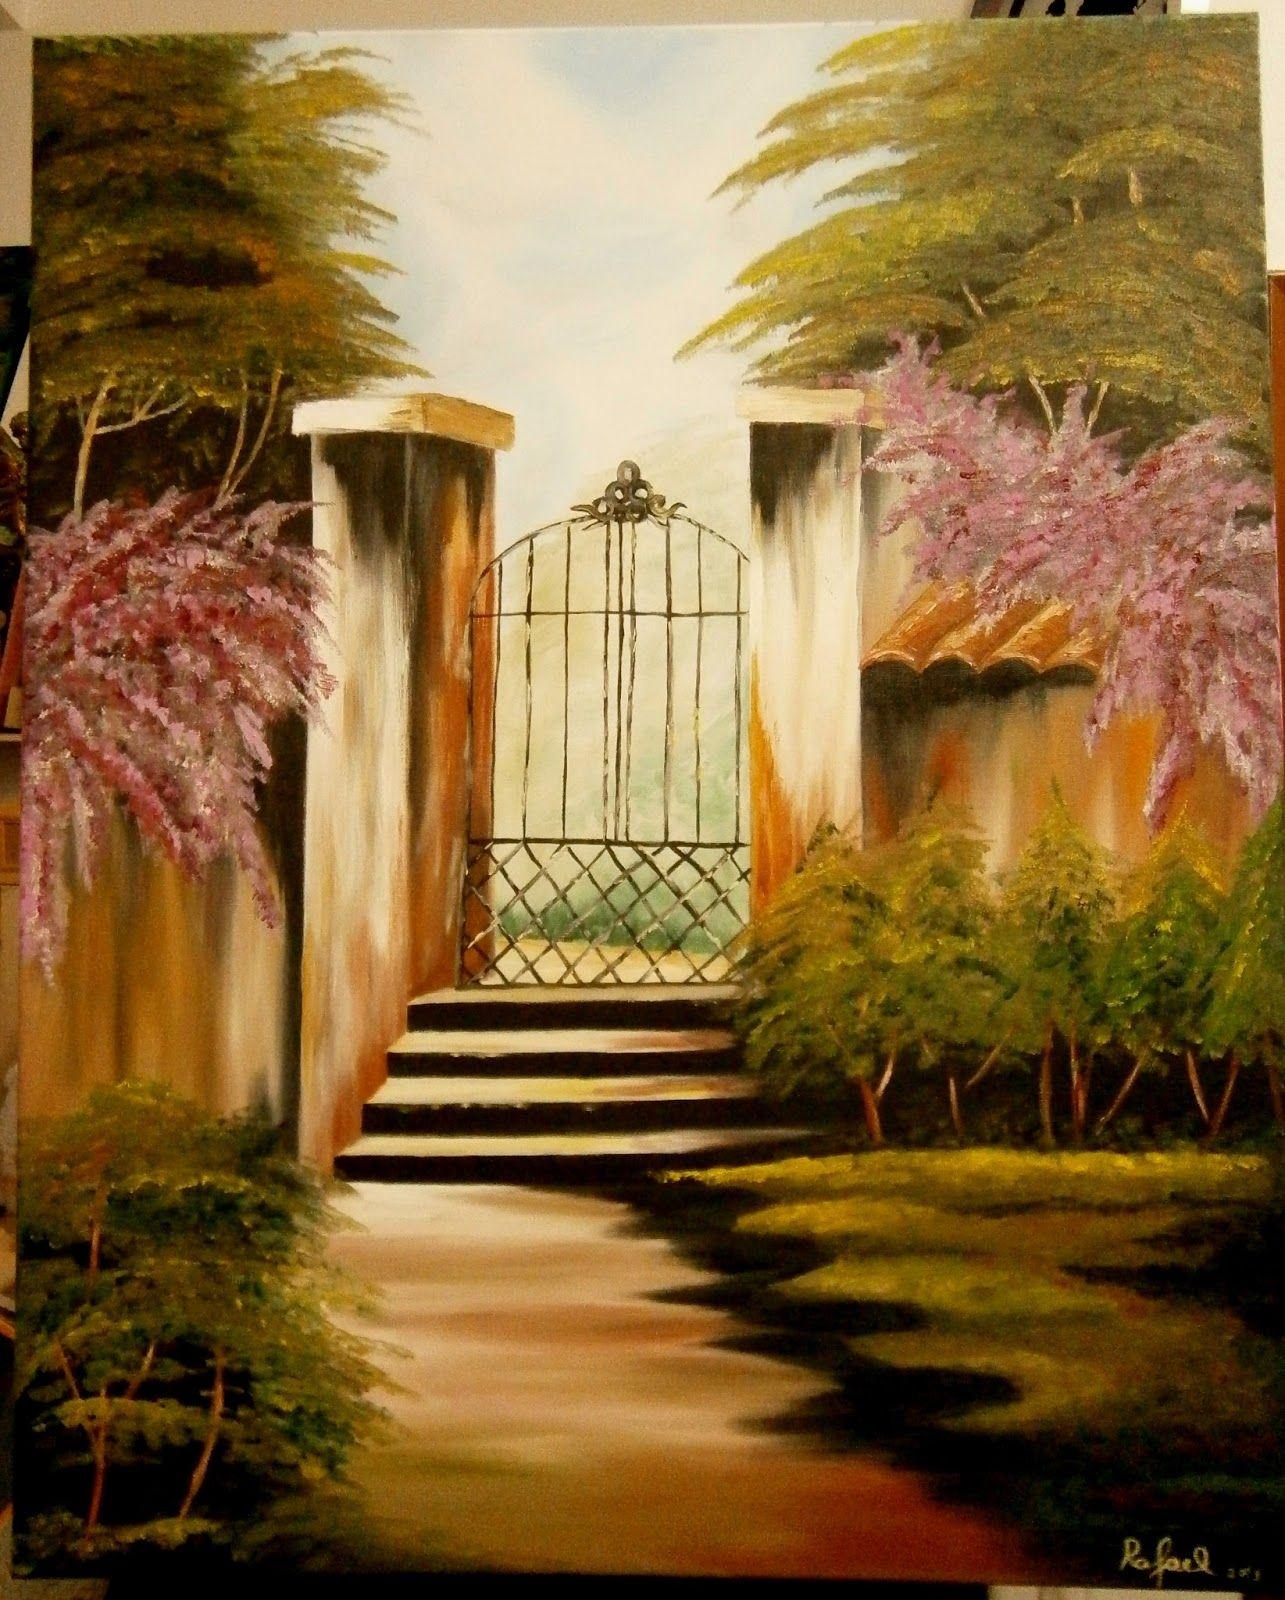 Fotos de pintura em tela